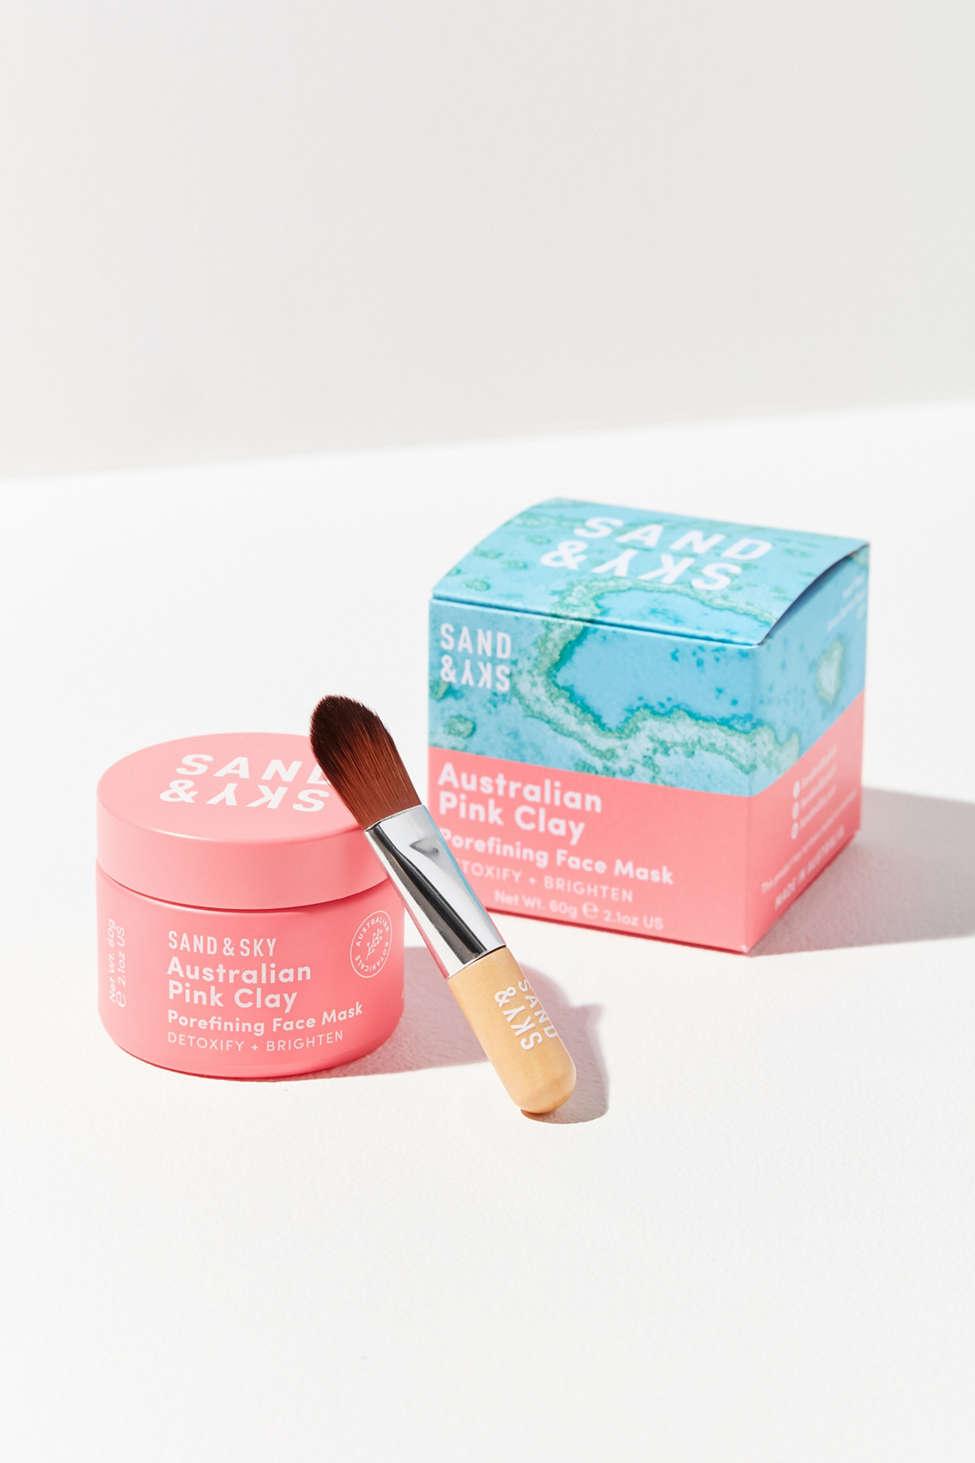 Sand&Sky Australian Pink Clay Face Mask by Sand&Amp;Sky